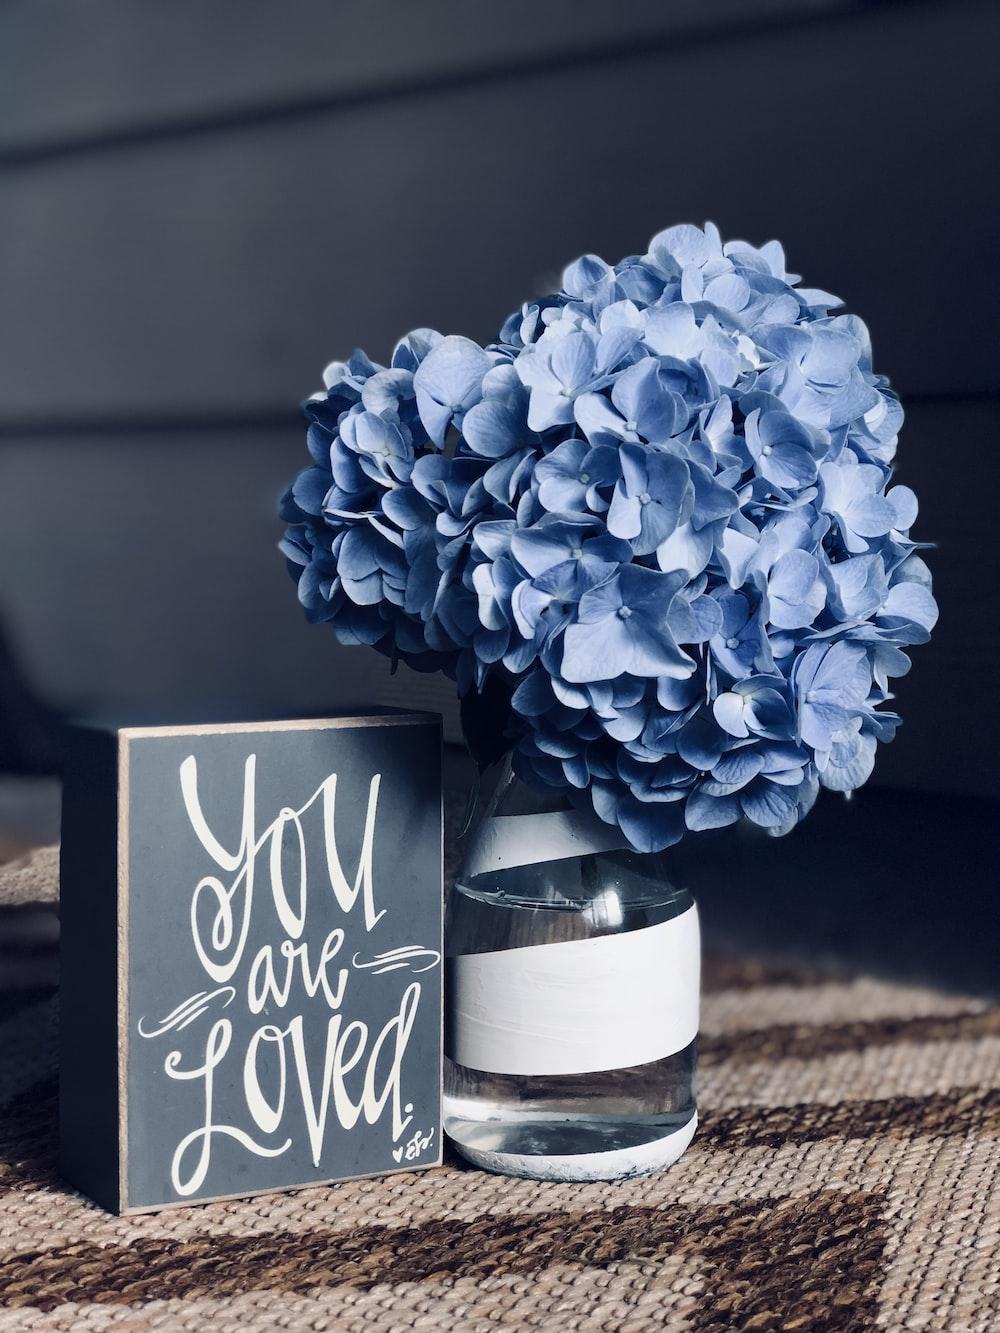 blue flowers in glass vase